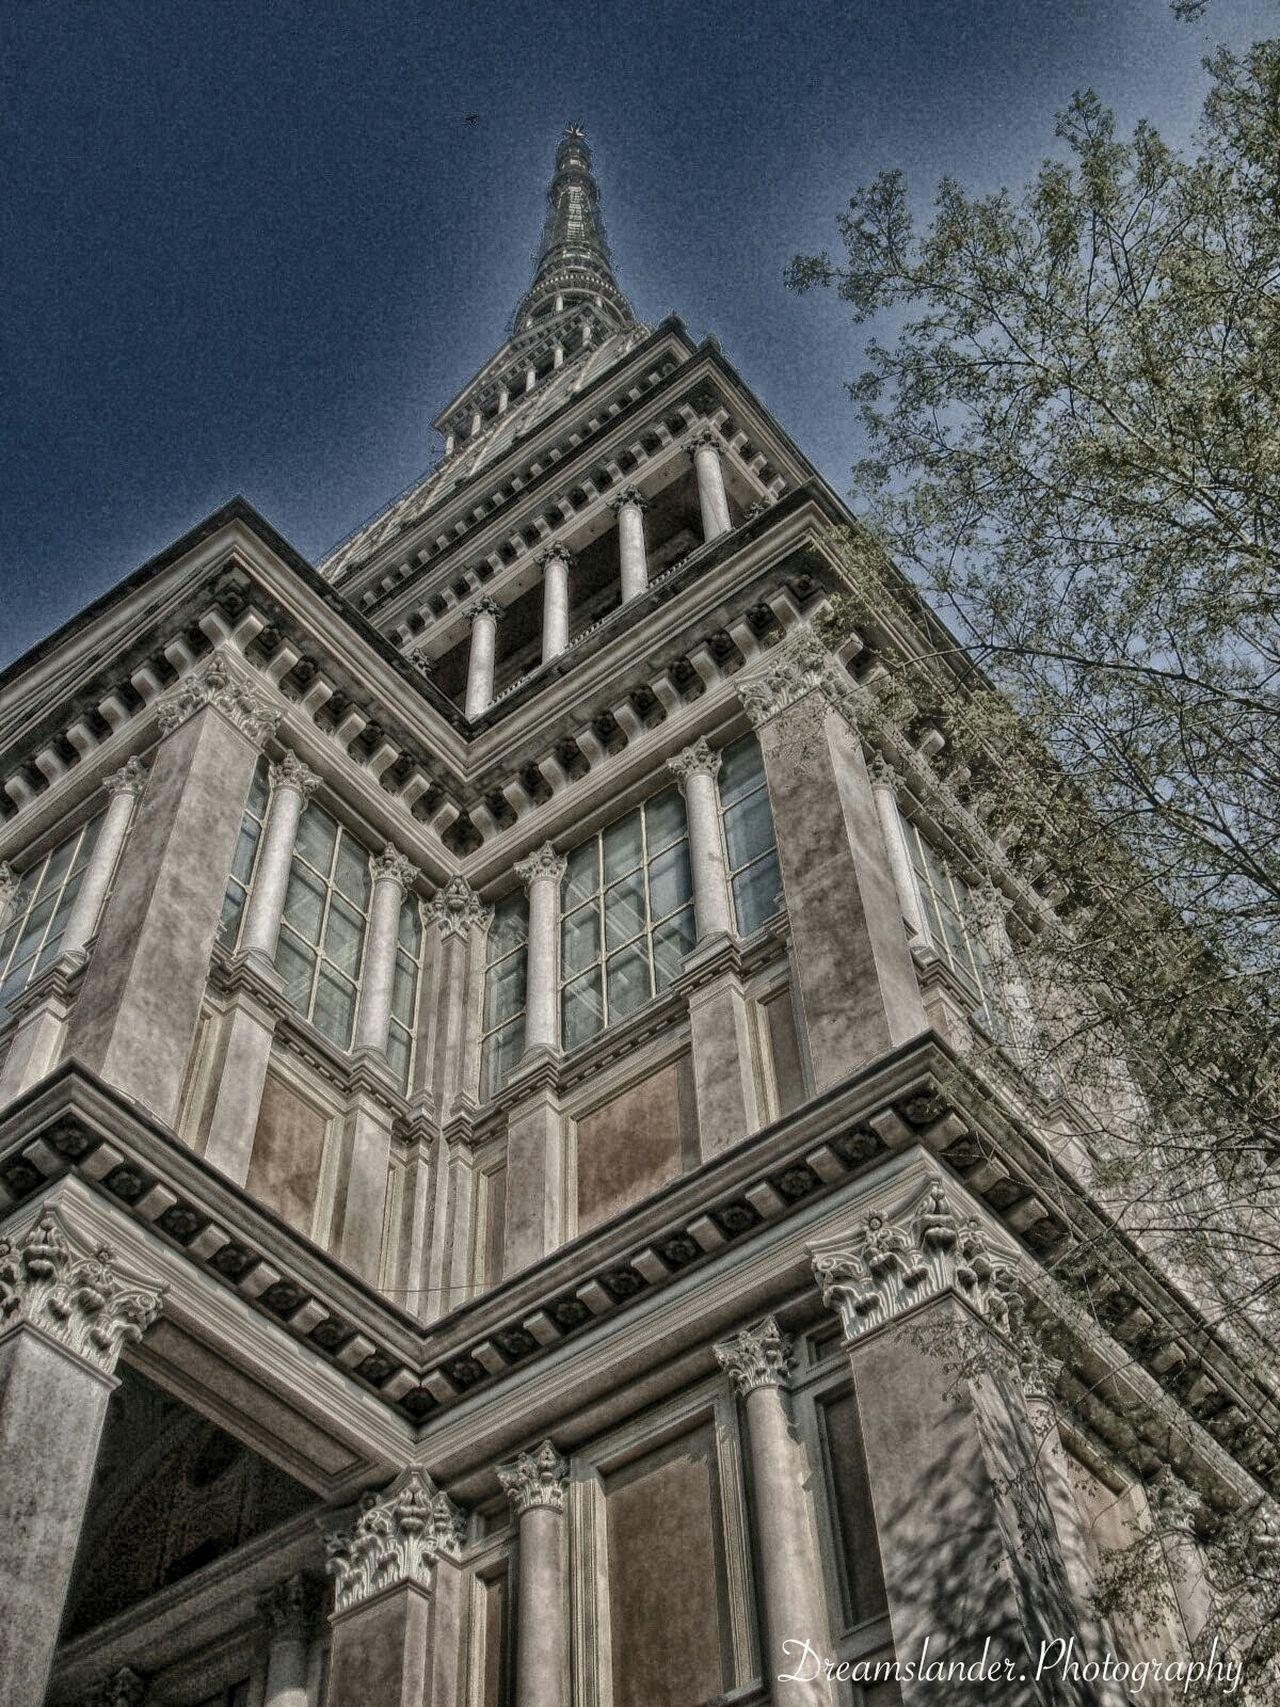 Street Photography Travel Photography Torino , La Mole Architecture Urban Architecture Tower